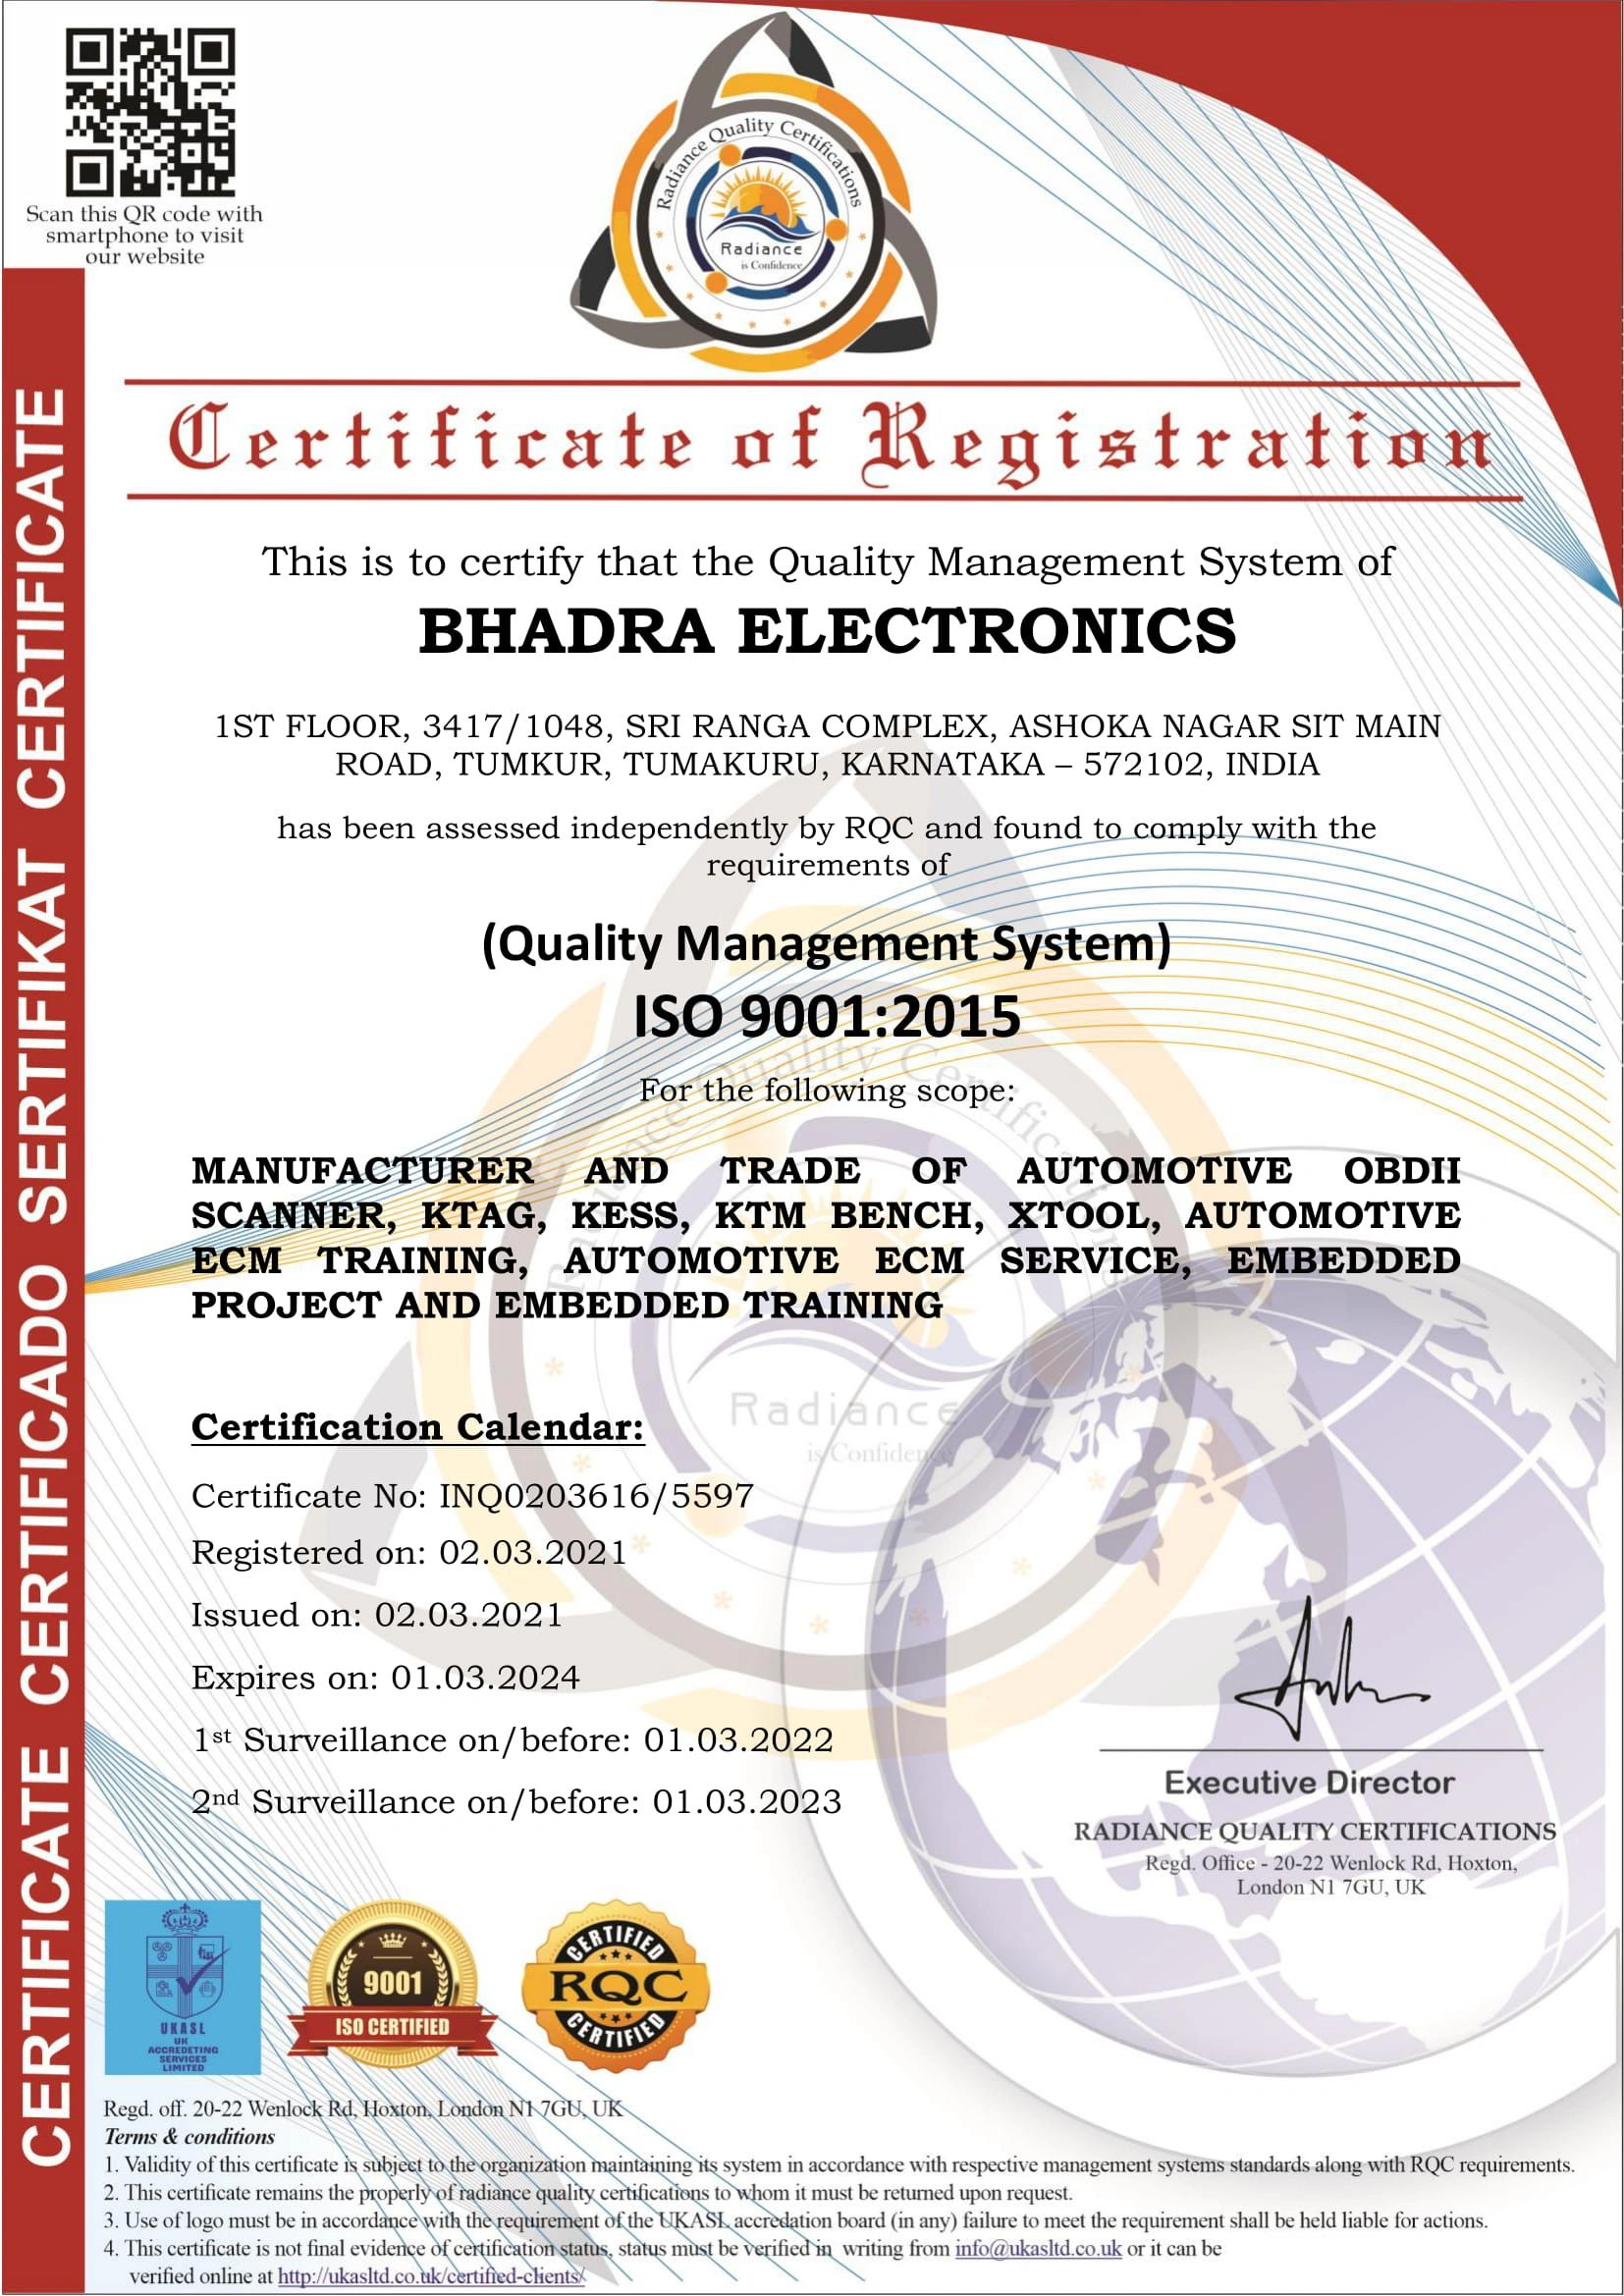 Ecu Calendar 2022.Certified Ecu Training Institute Bhadra Electronics Bhadra Electronics